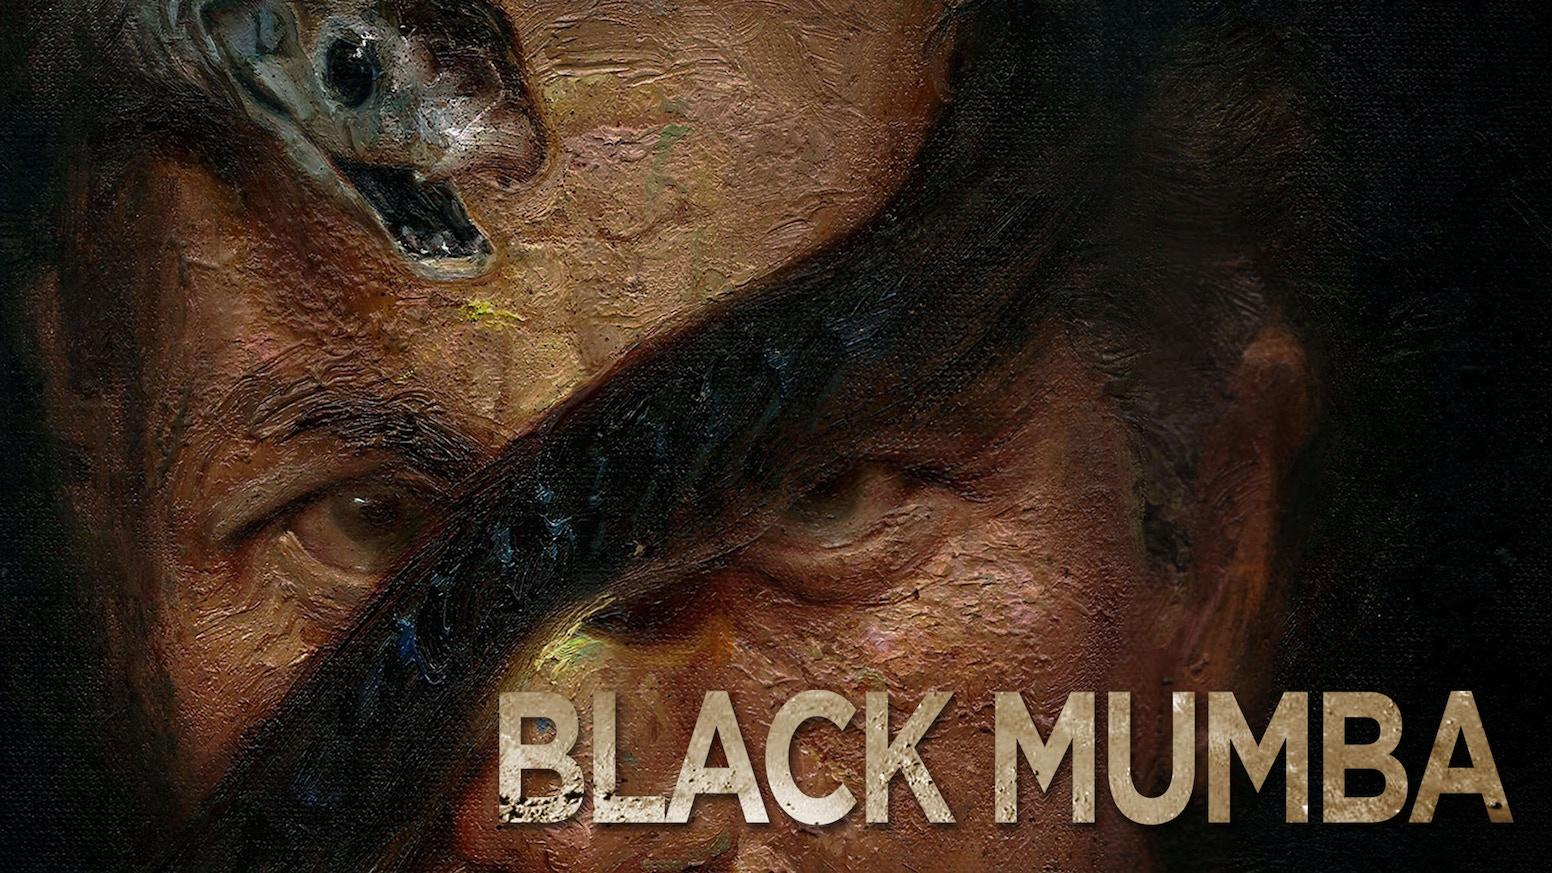 Black Mumba - The Hardcover Graphic Novel by Ram Venkatesan